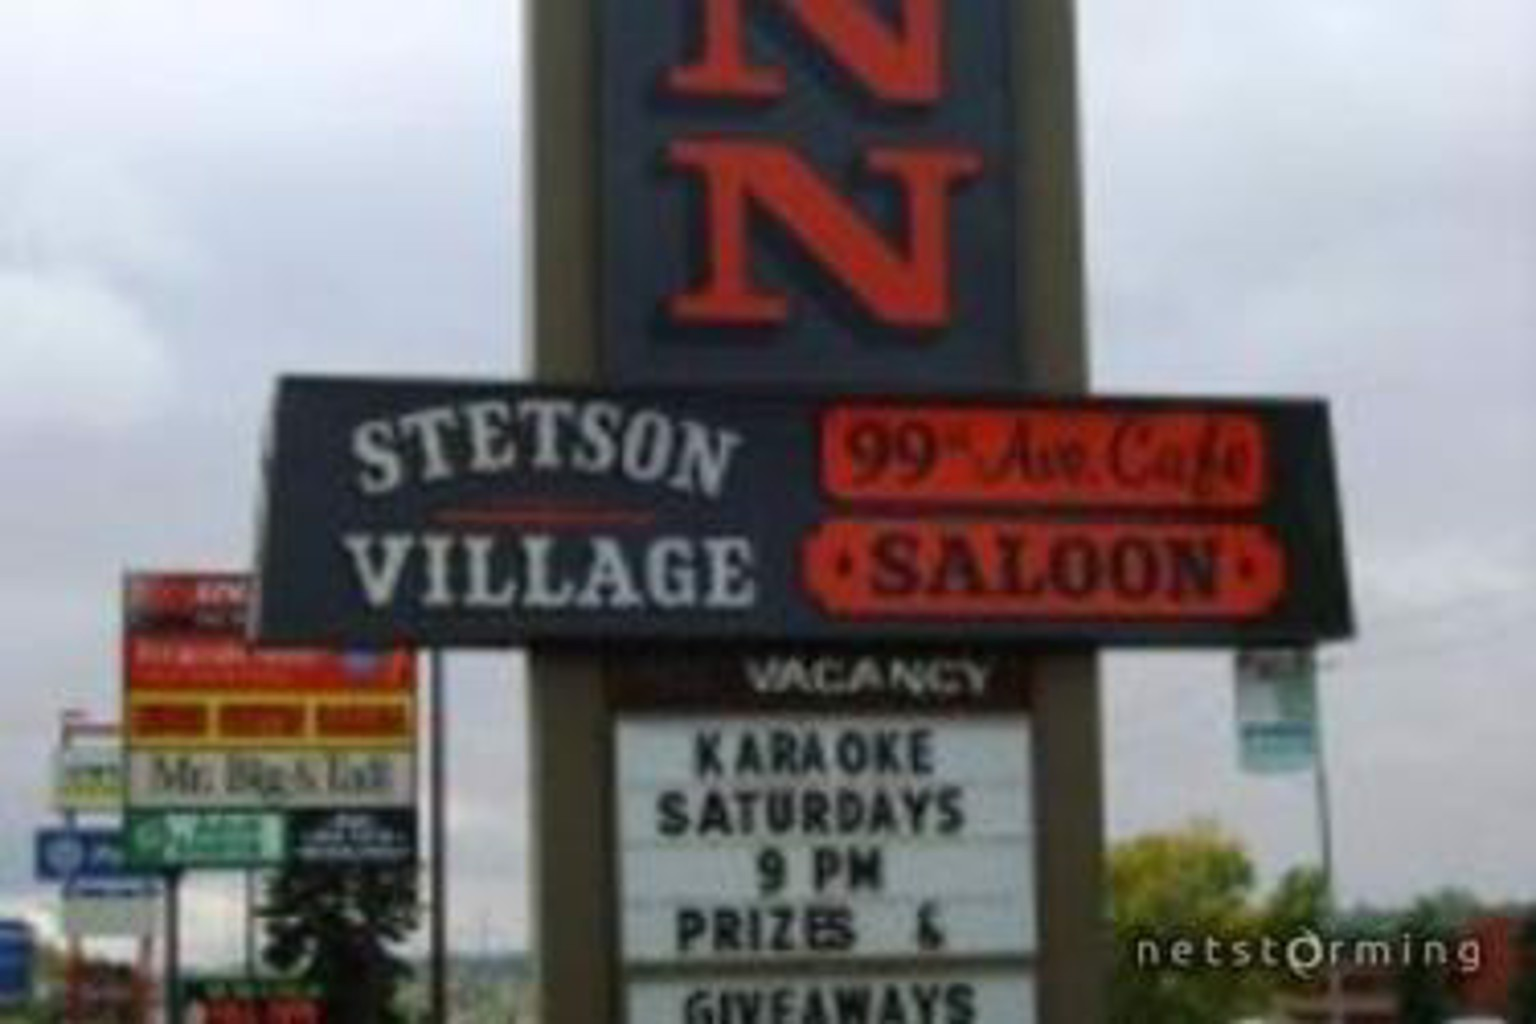 Stetson Village Inn